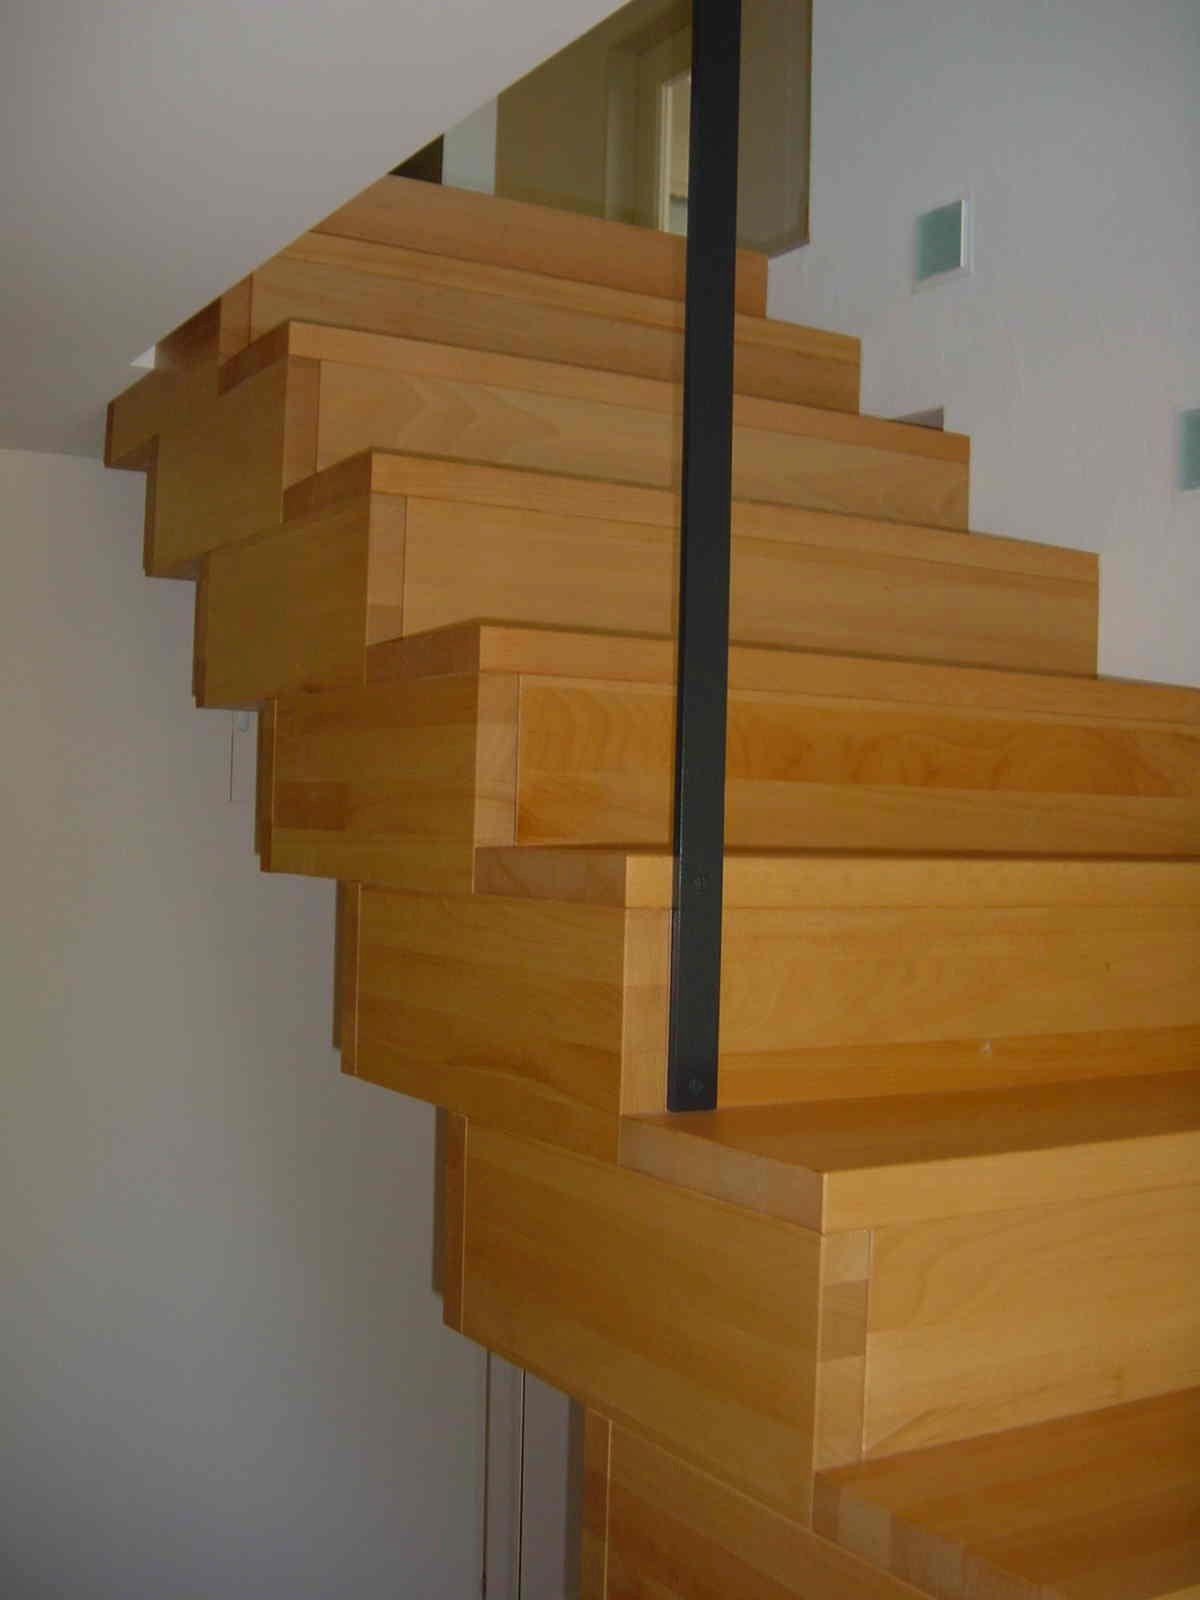 Stair Image 38